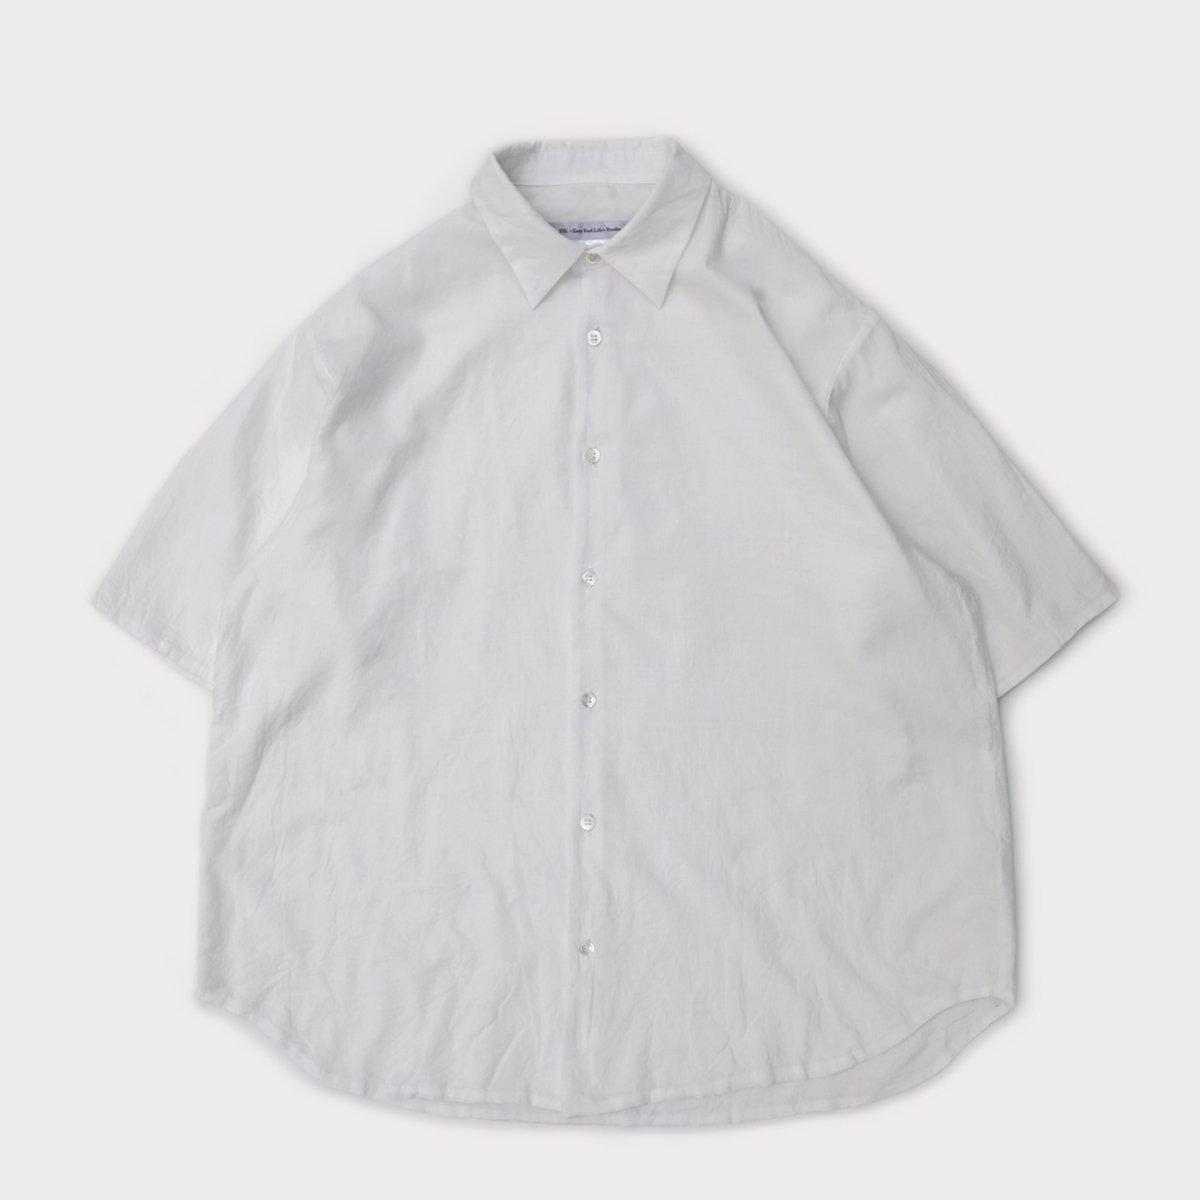 Merci Shirt Khadi Ver. White